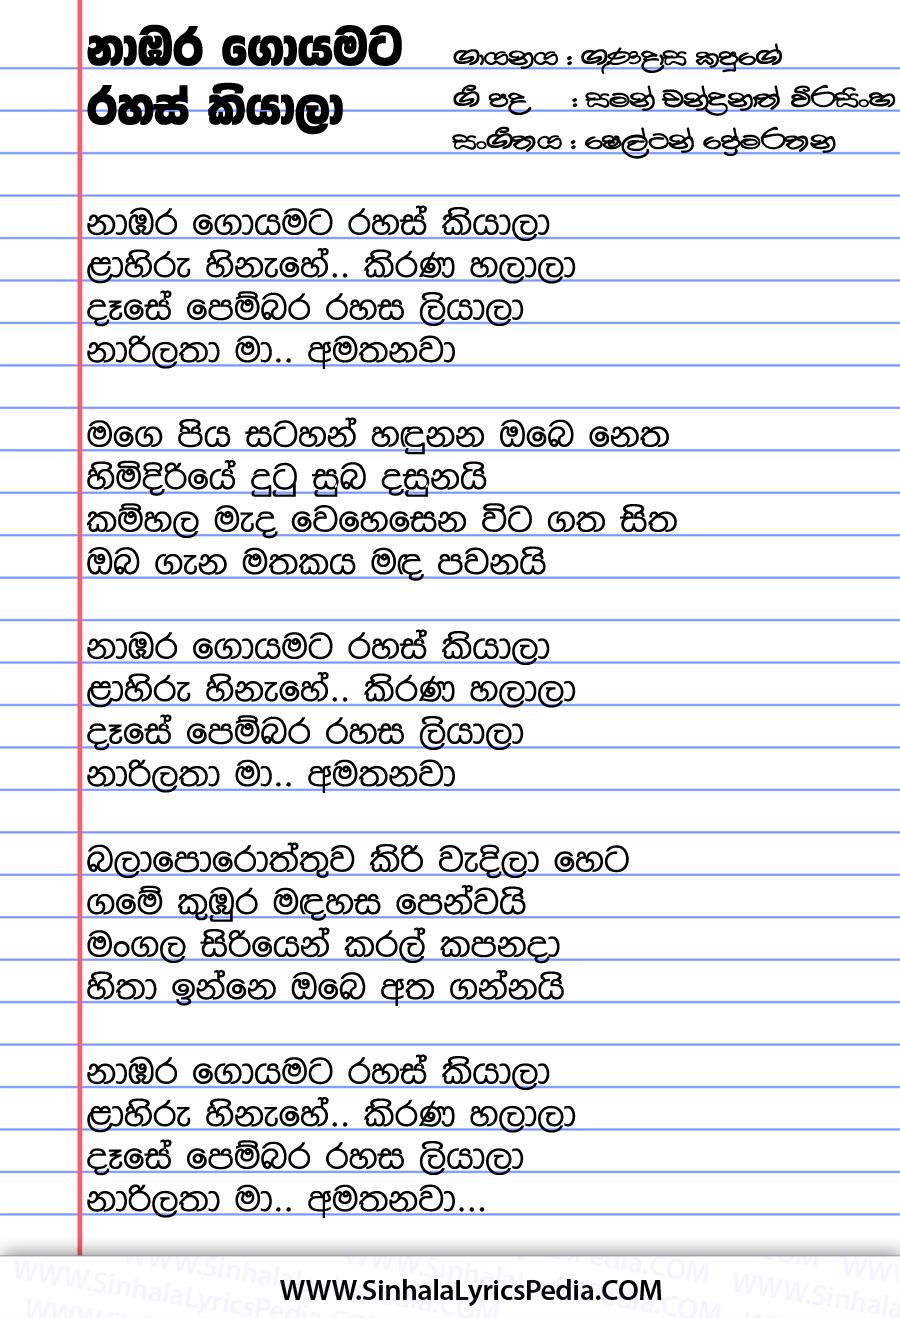 Nambara Goyamata Rahas Kiyala Song Lyrics